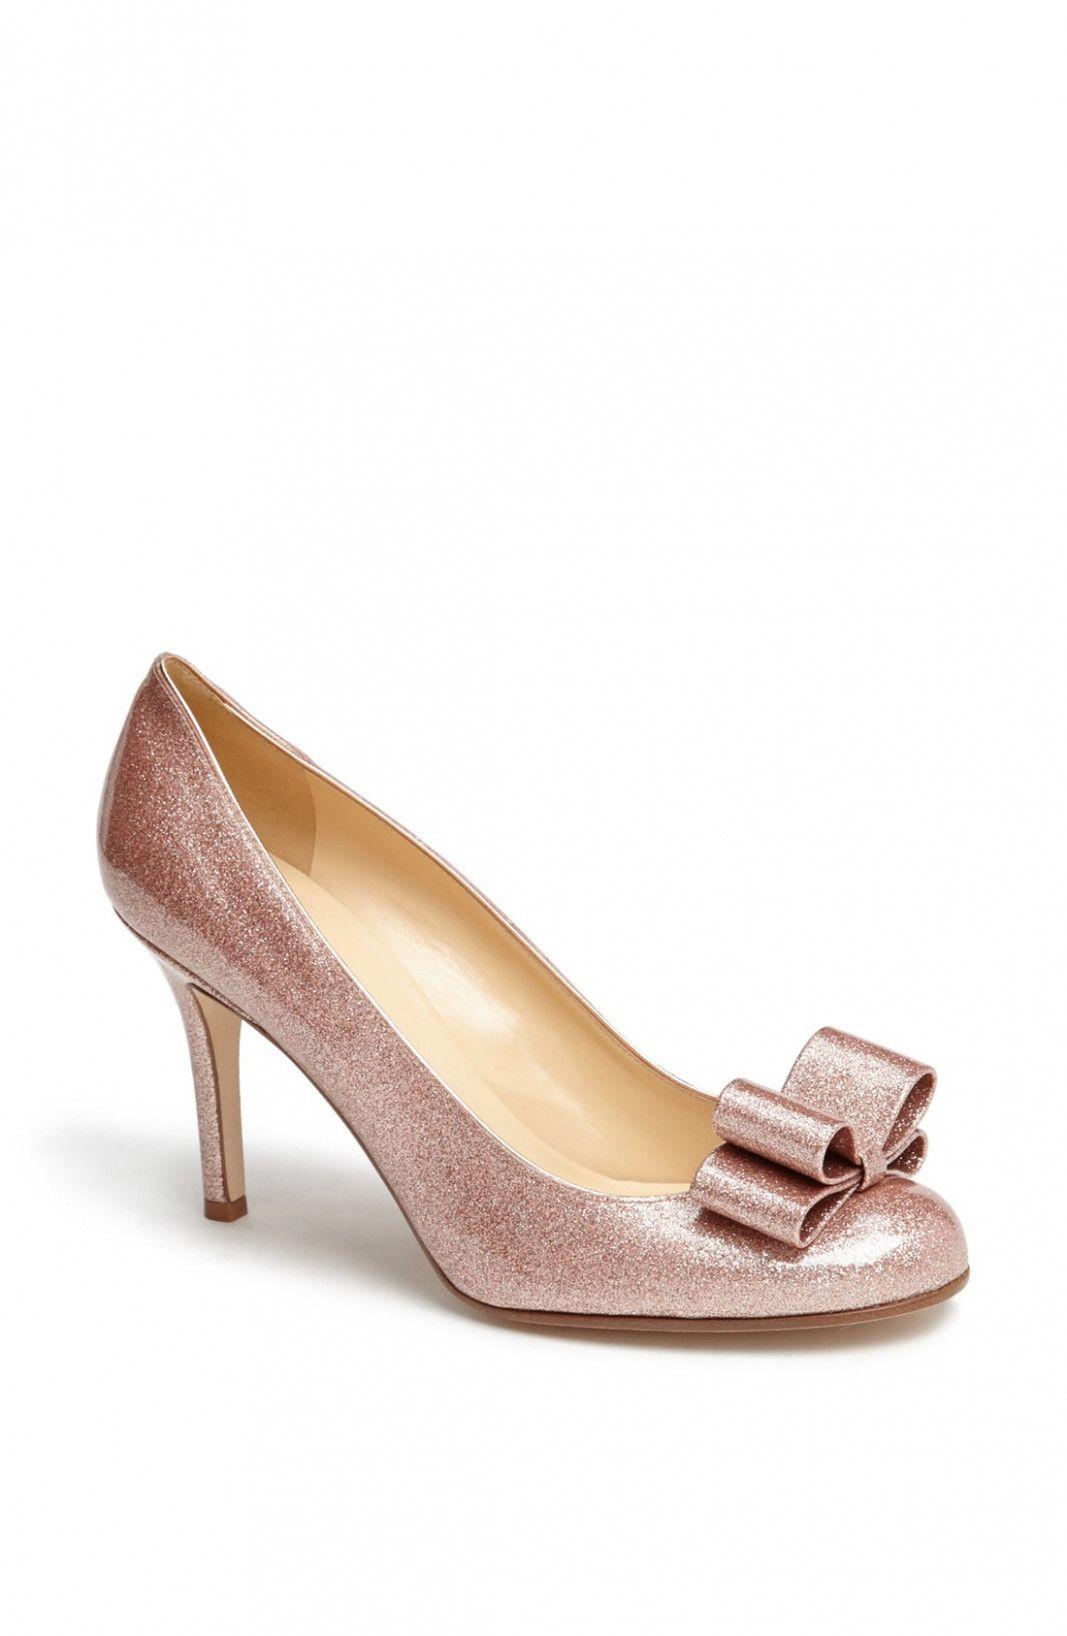 86306a886082 kate spade krysta pump in pink rose gold glitter patent lyst  RoseGold   WeddingHeelsKateSpade